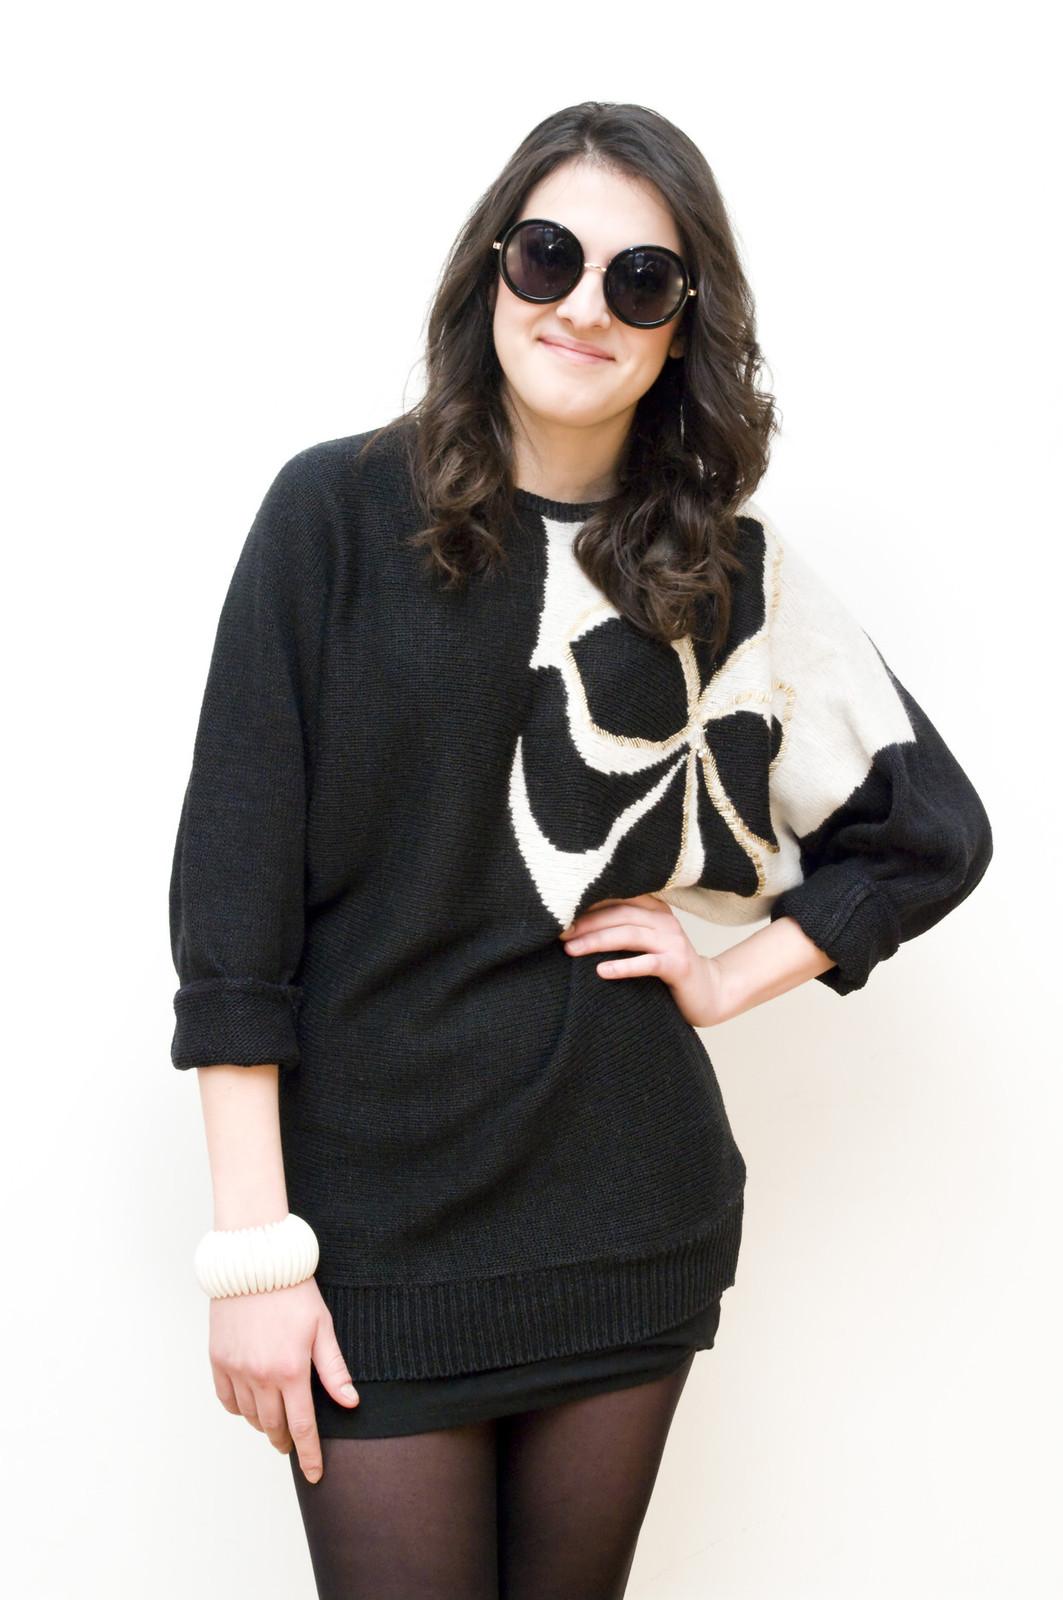 Bat sleeve sweater - $13.81